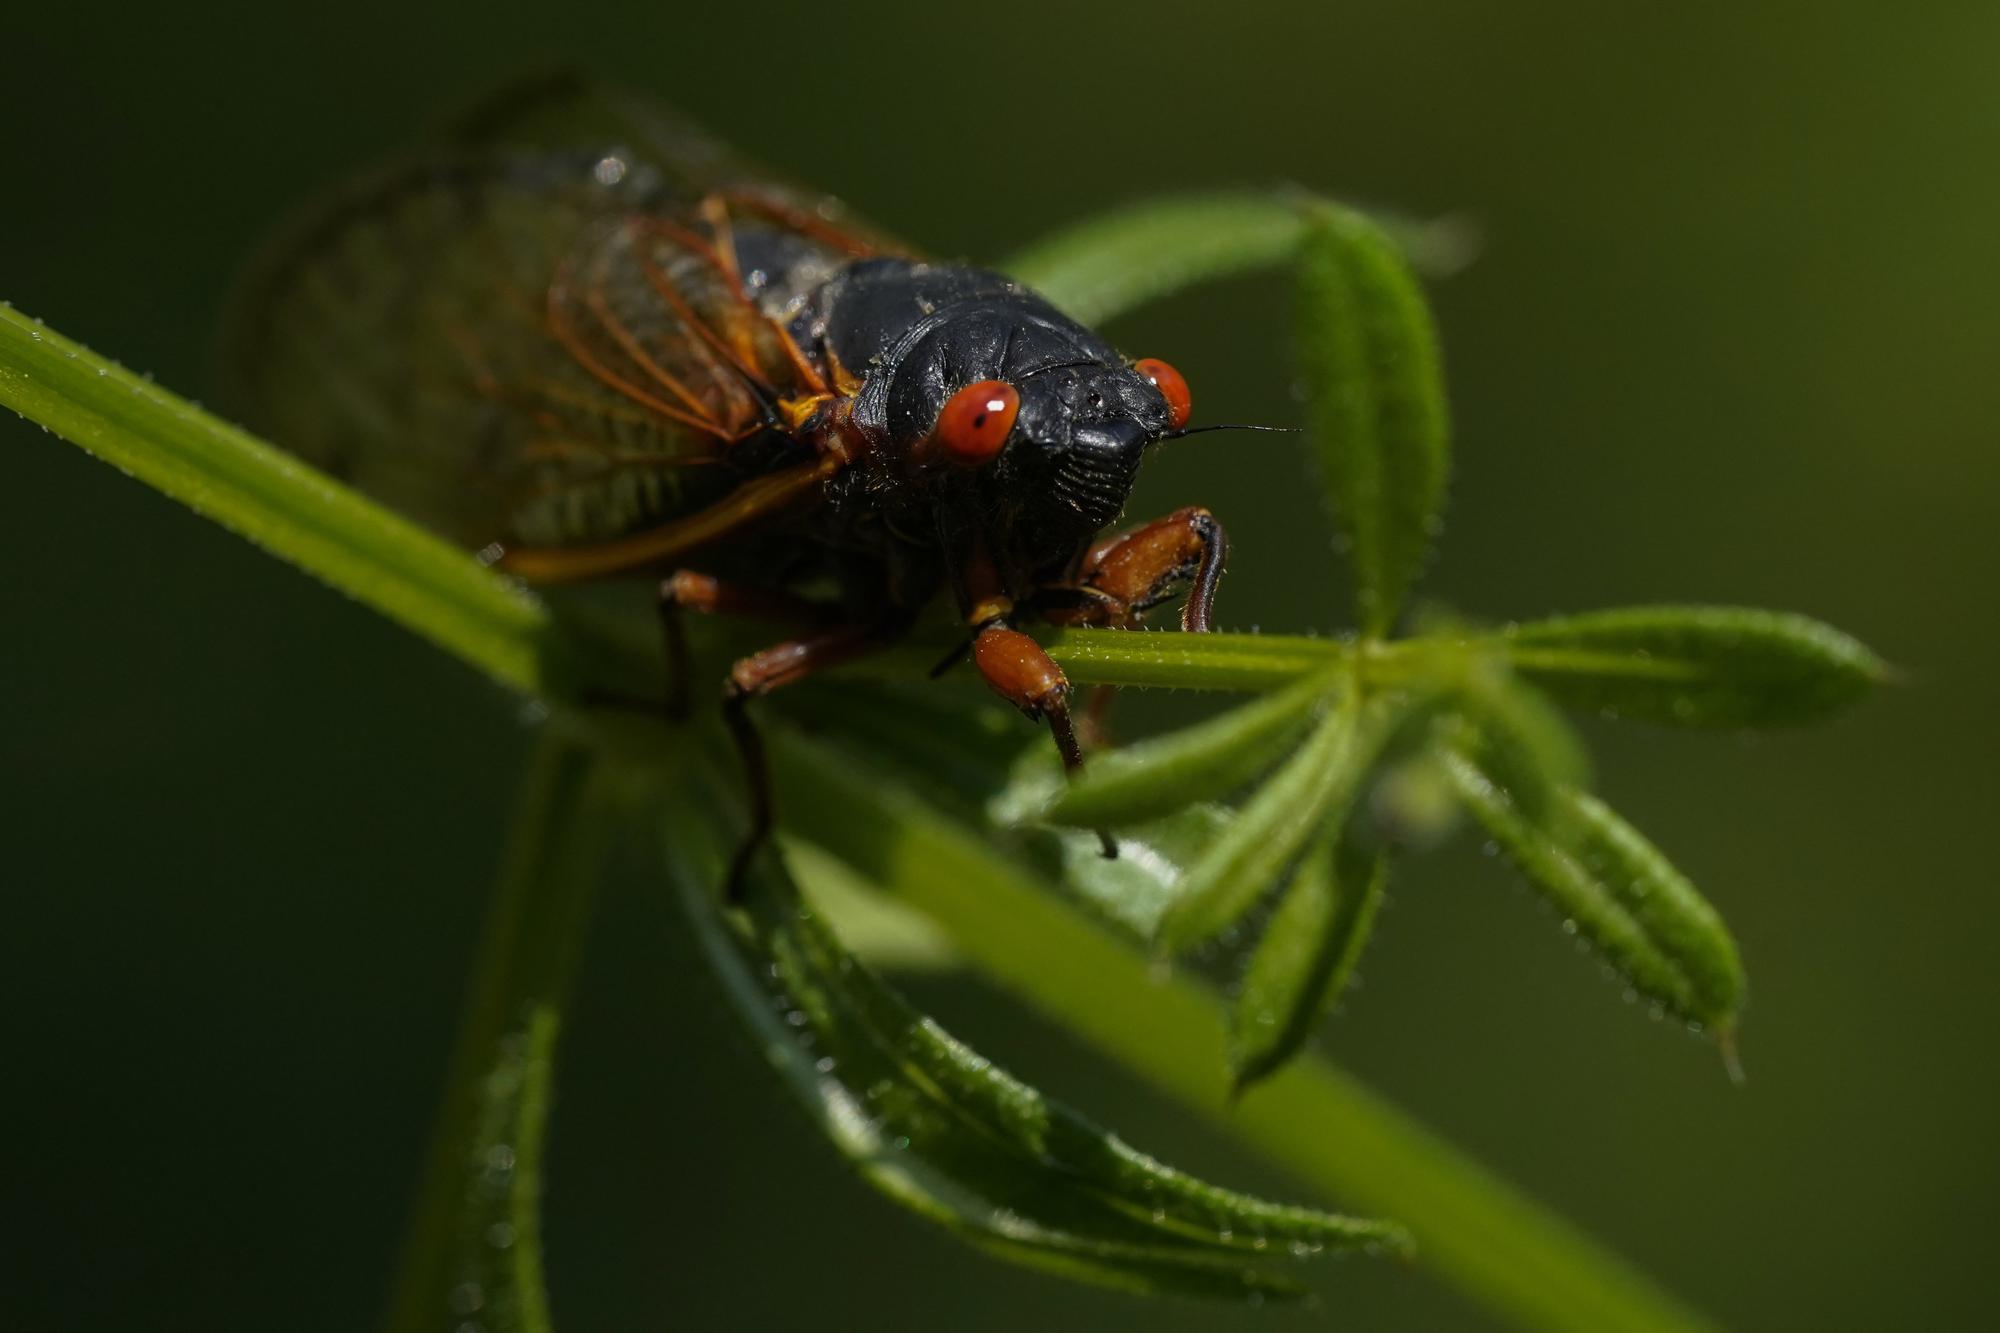 An adult cicada moves along in Washington, Wednesday, May 12, 2021. (AP Photo/Carolyn Kaster)